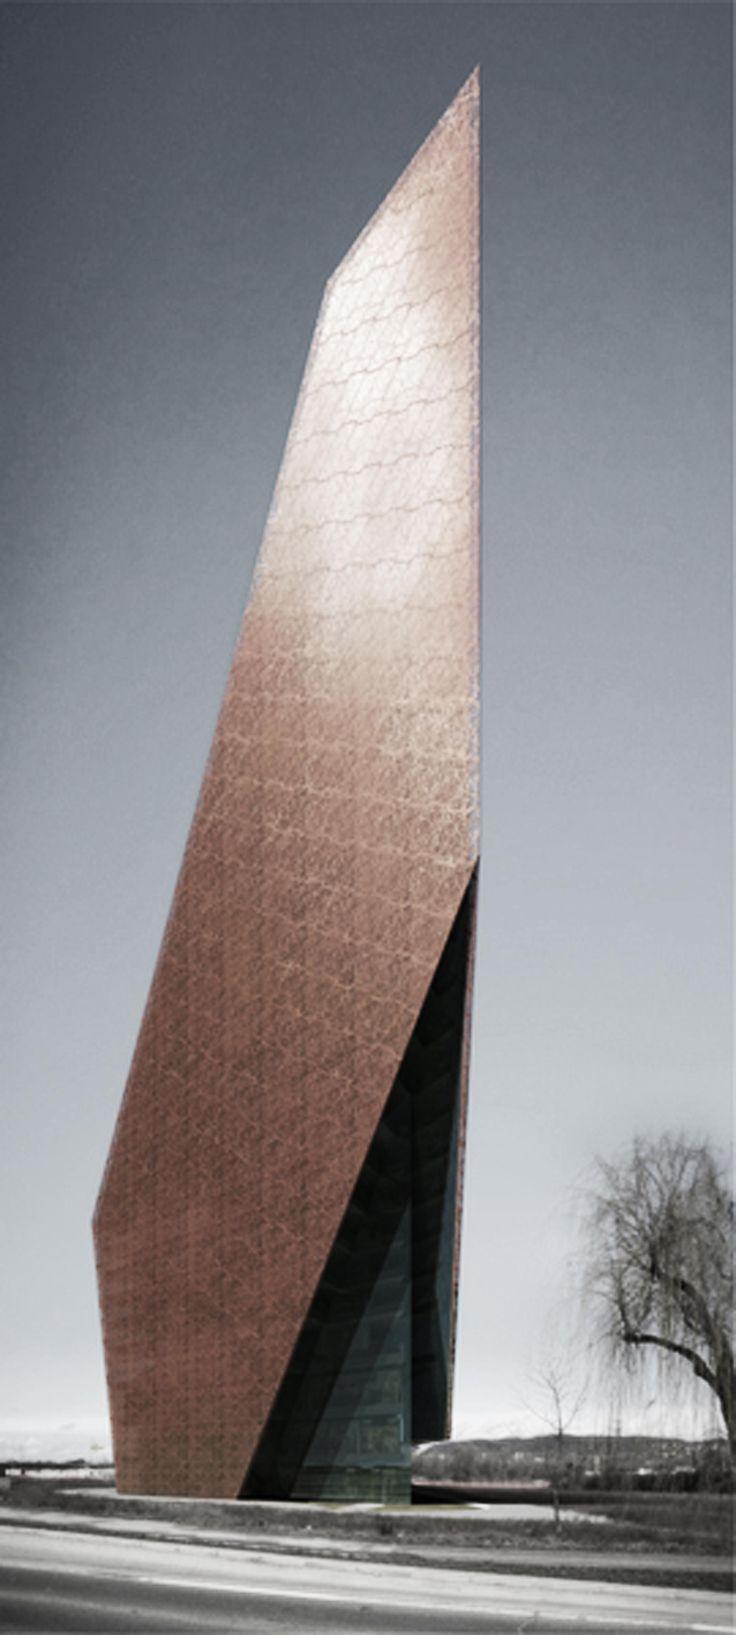 H/2_CRODUX TOWER,Croatia,by UPI2M 20+10+X World Architecture Community Awards 5. Cycle Winner